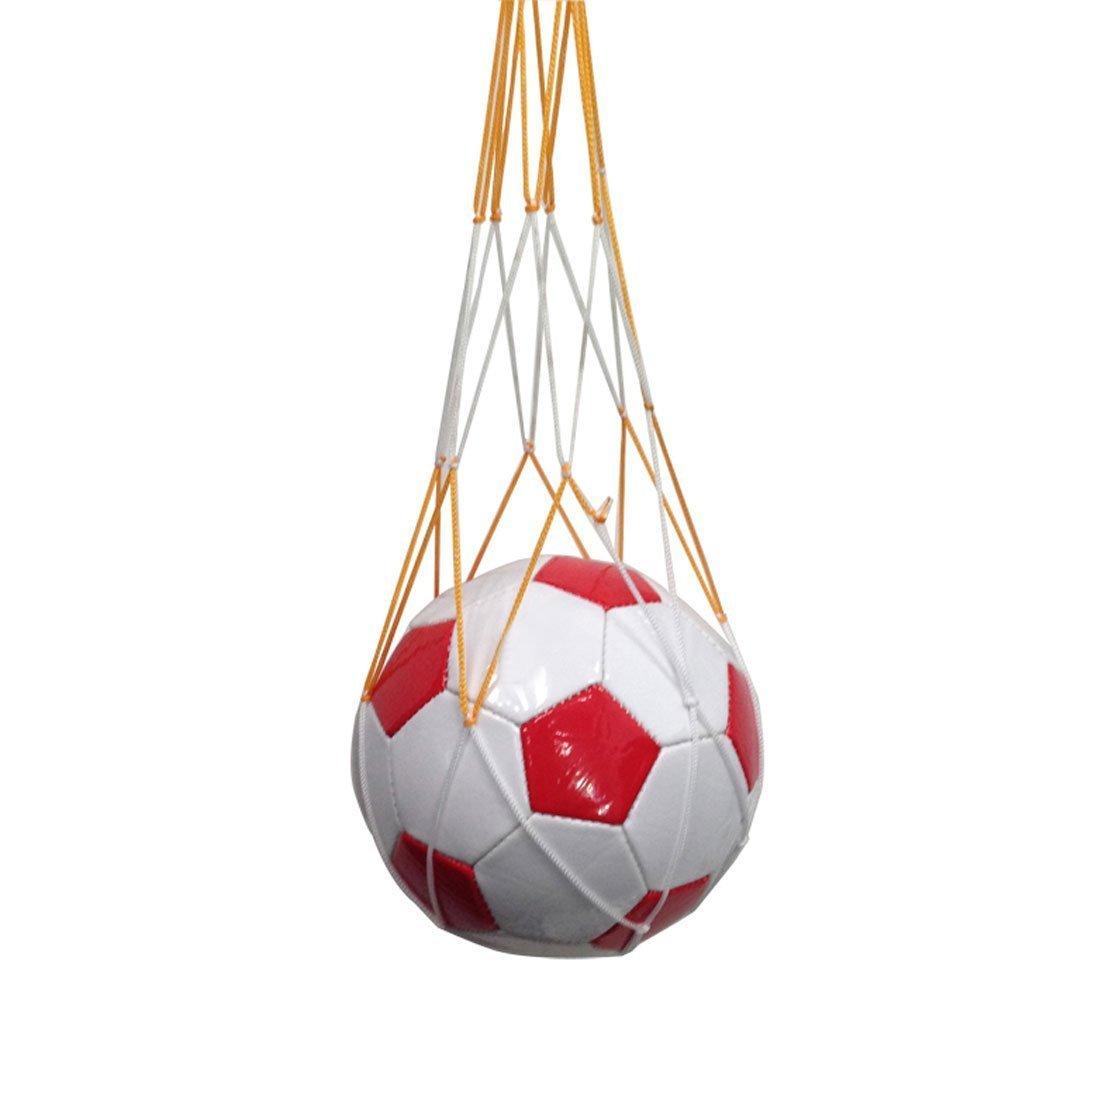 Nylon Mesh Bola neta voleibol baloncesto fútbol llevar bolsa de ...